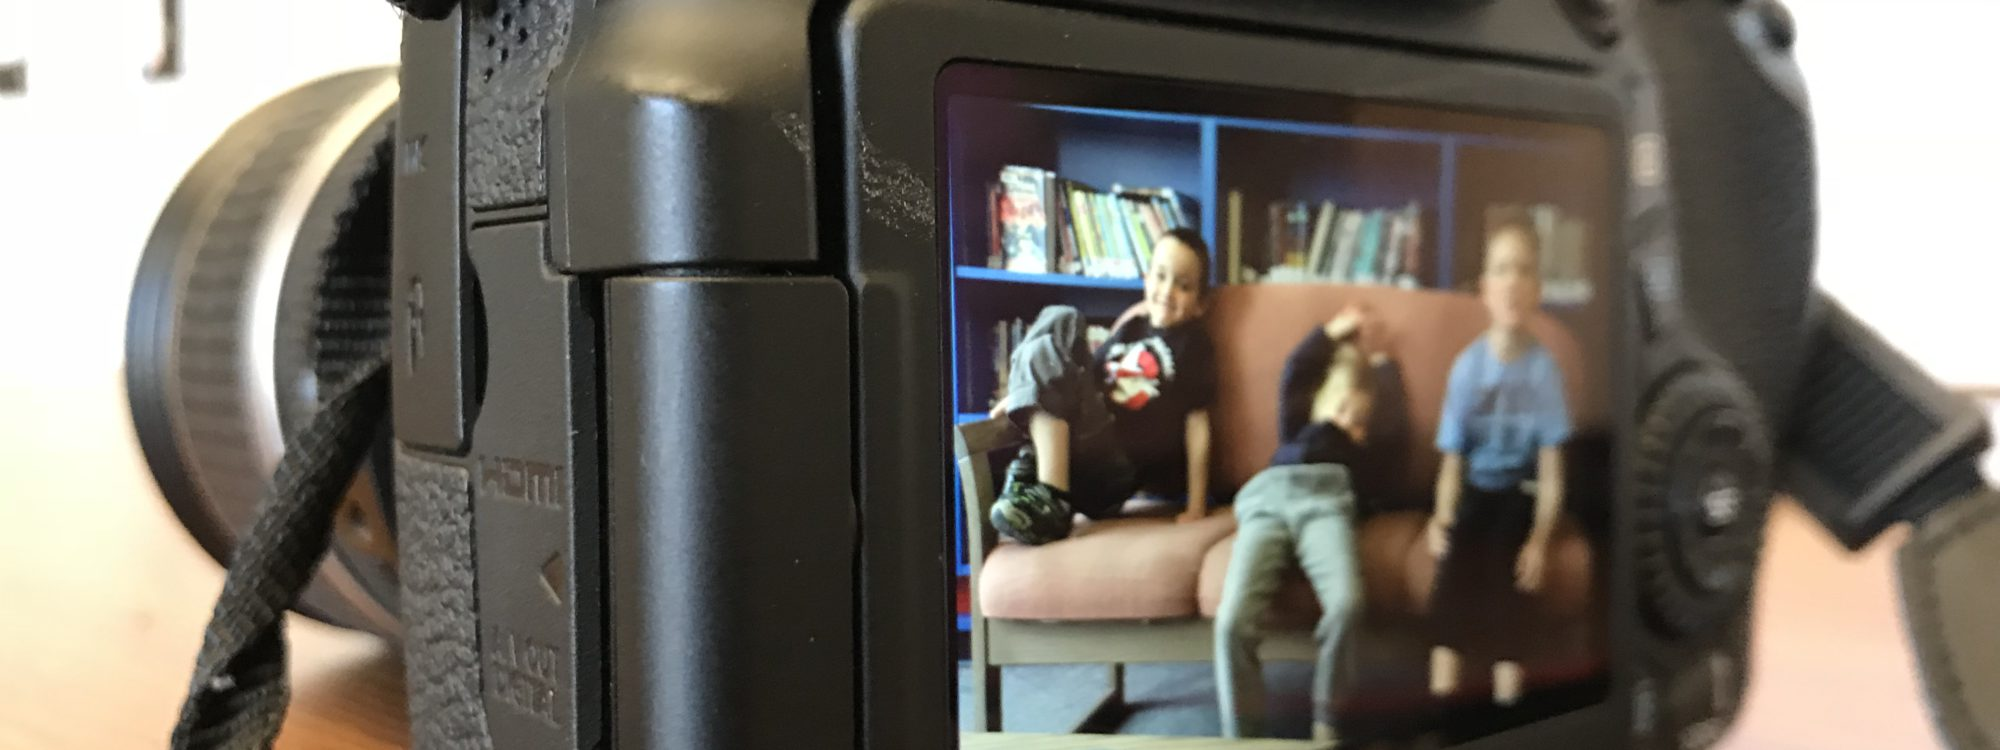 close up of a camera's screen